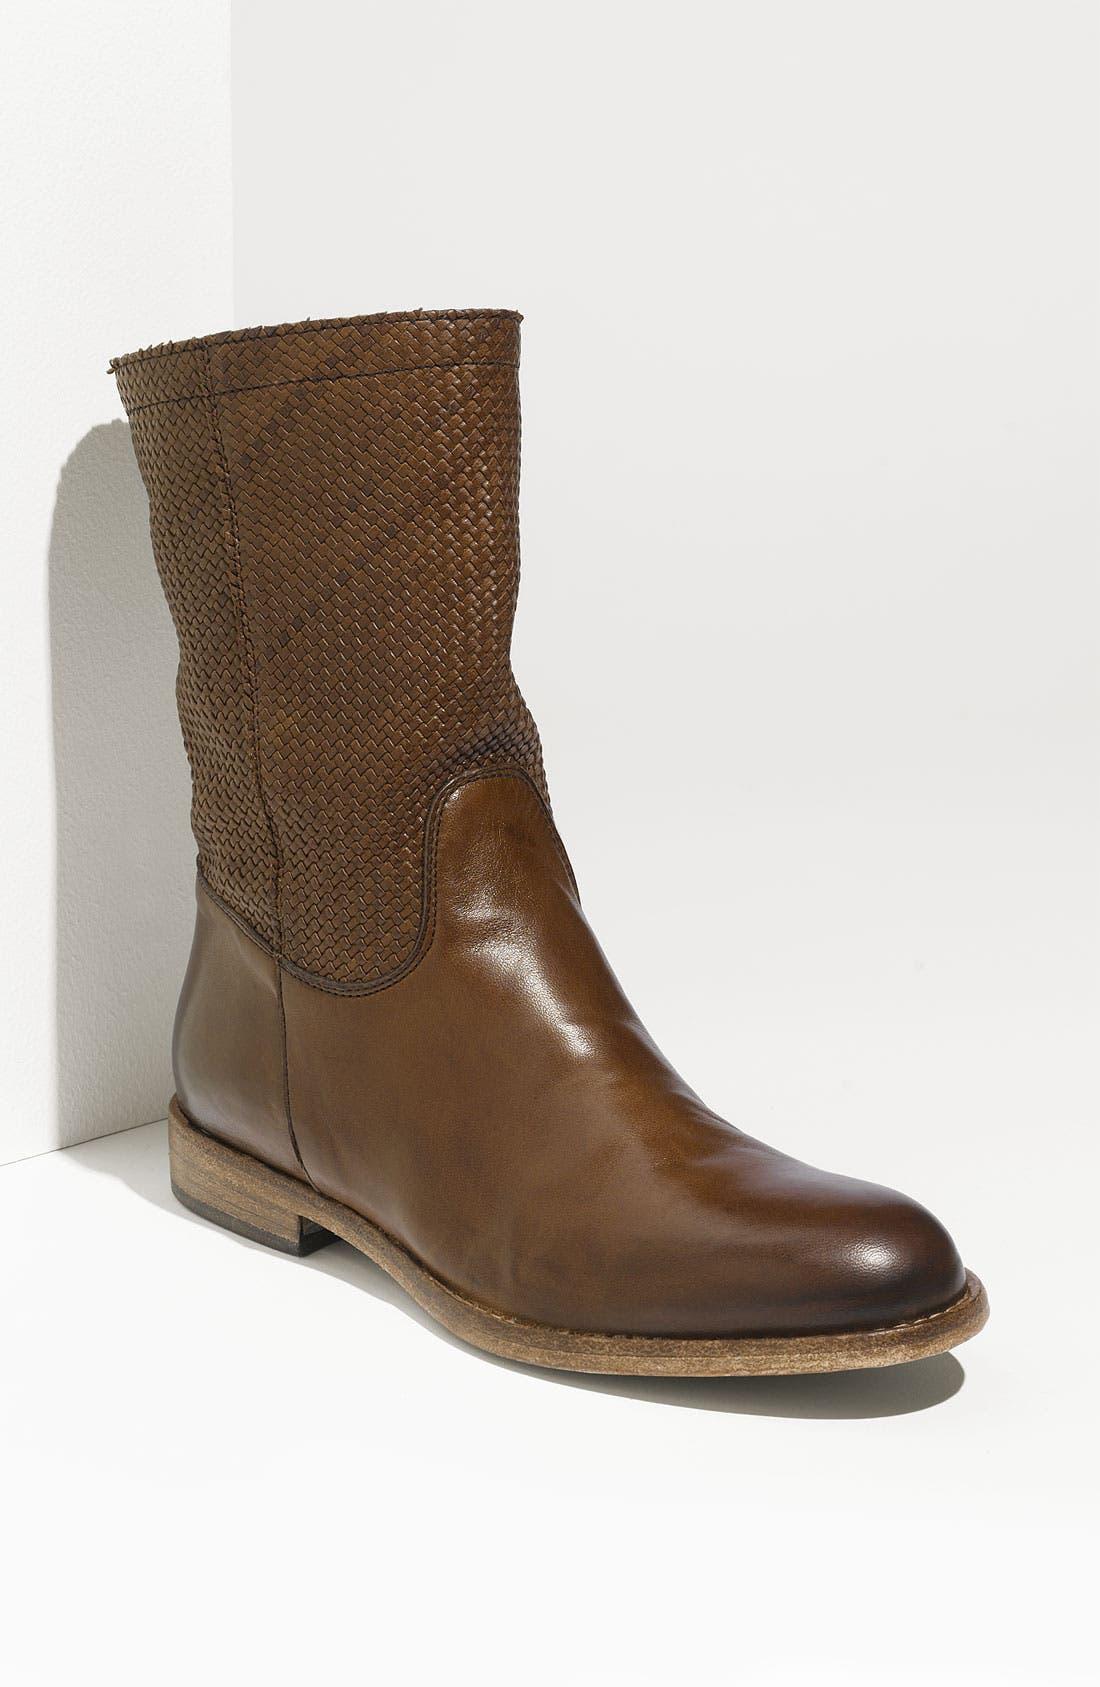 Alternate Image 1 Selected - Alberto Fermani Leather Boot